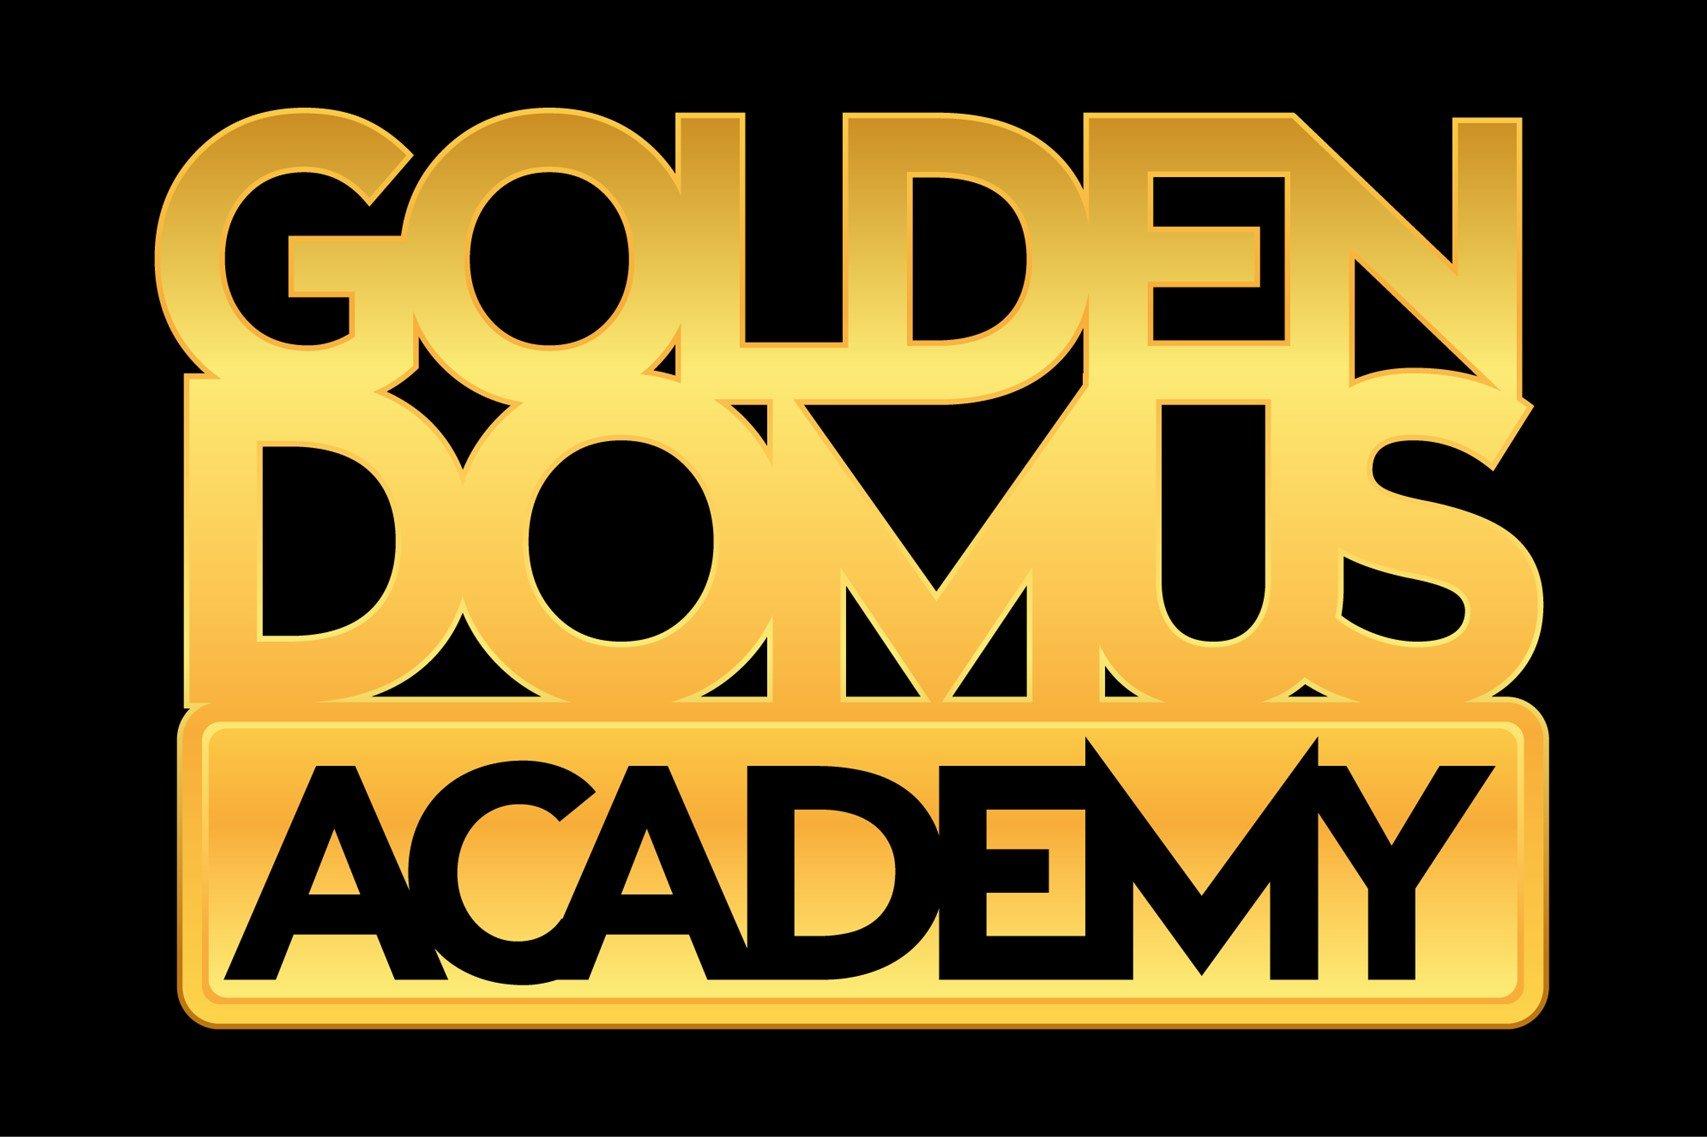 Golden domus Academy Gruppo Toscano Immobiliare